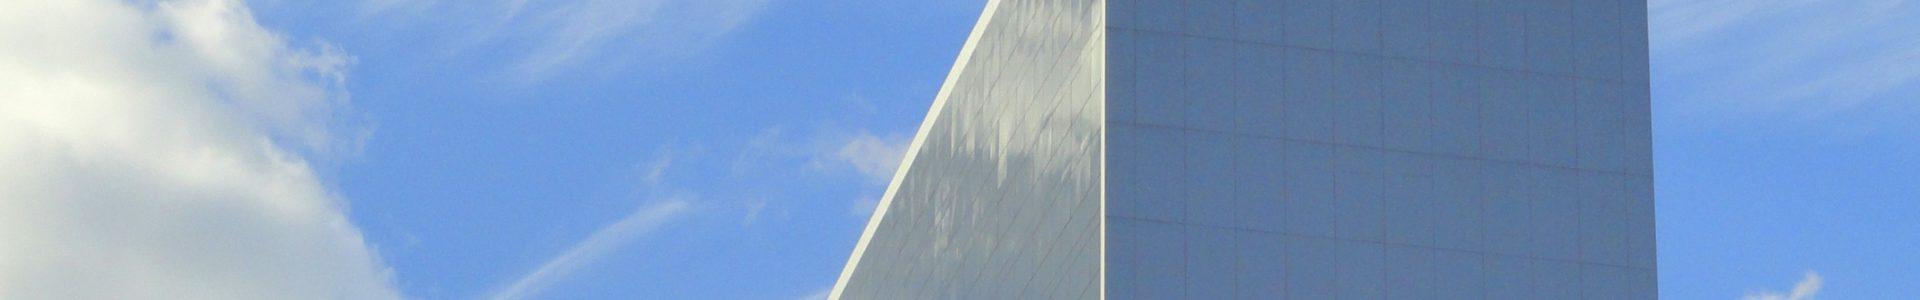 Sviluppo Centro Studi Aziendali